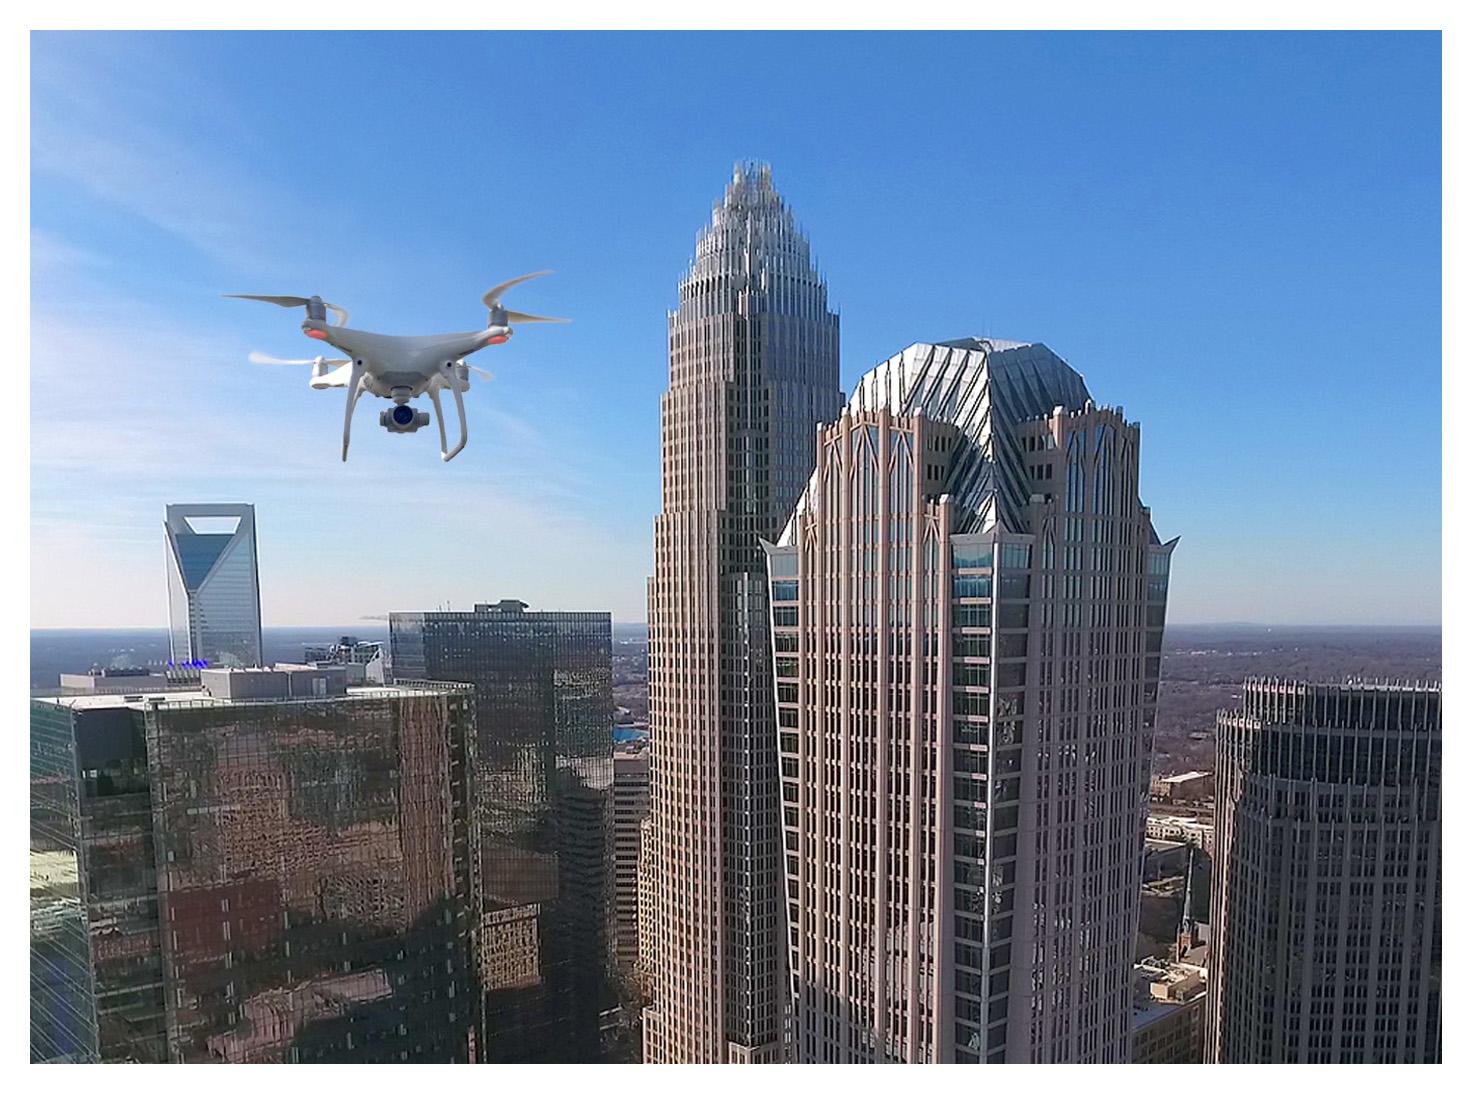 BIRDSiVIDEO Charlotte (Dickson Drone Imagery LLC) image 1